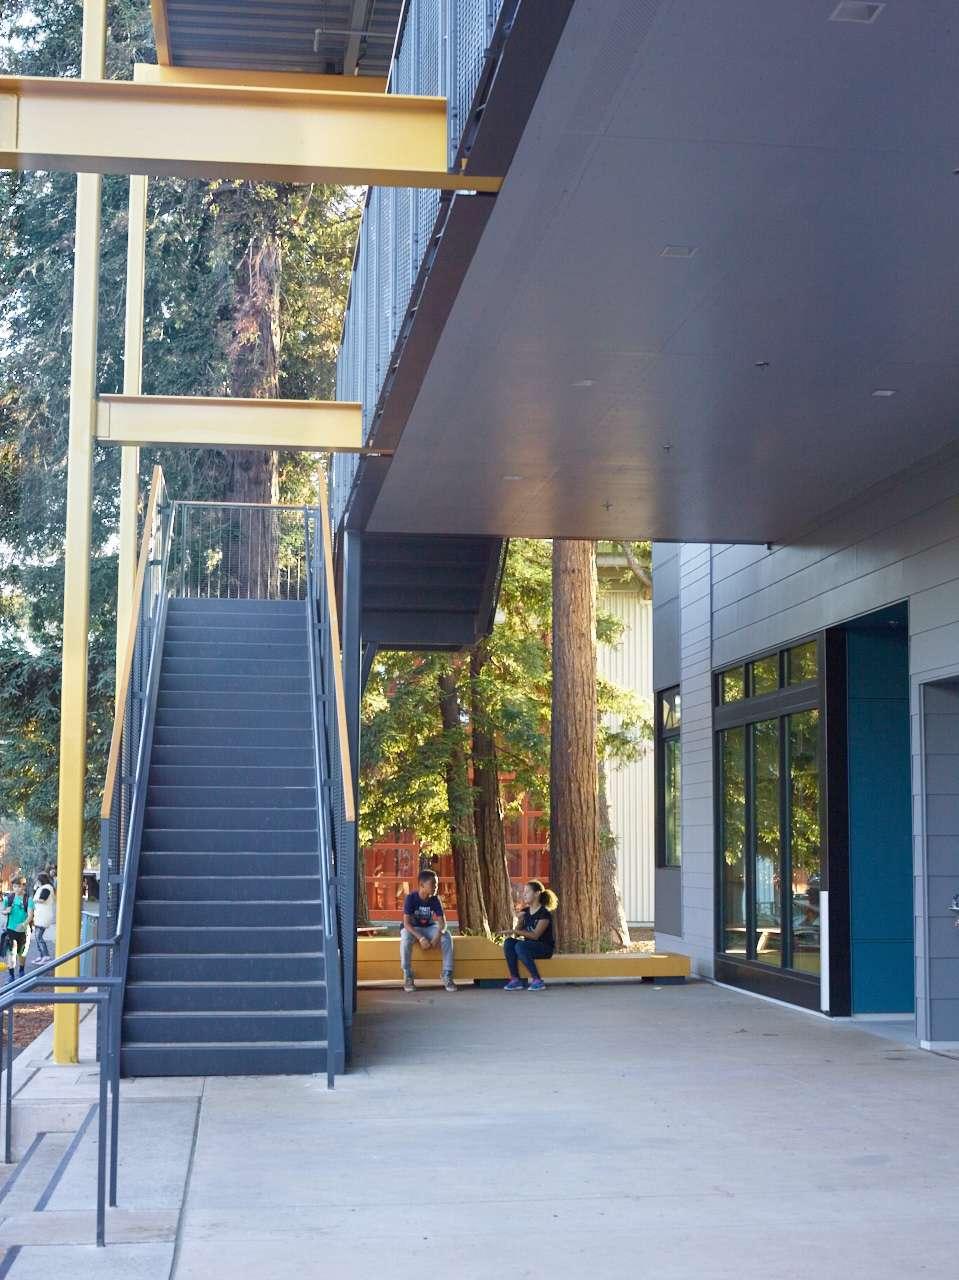 Redwood Day - school  | Photo 5 of 8 | Address: 3245 Sheffield Ave, Oakland, CA 94602, USA | Phone: (510) 534-0804